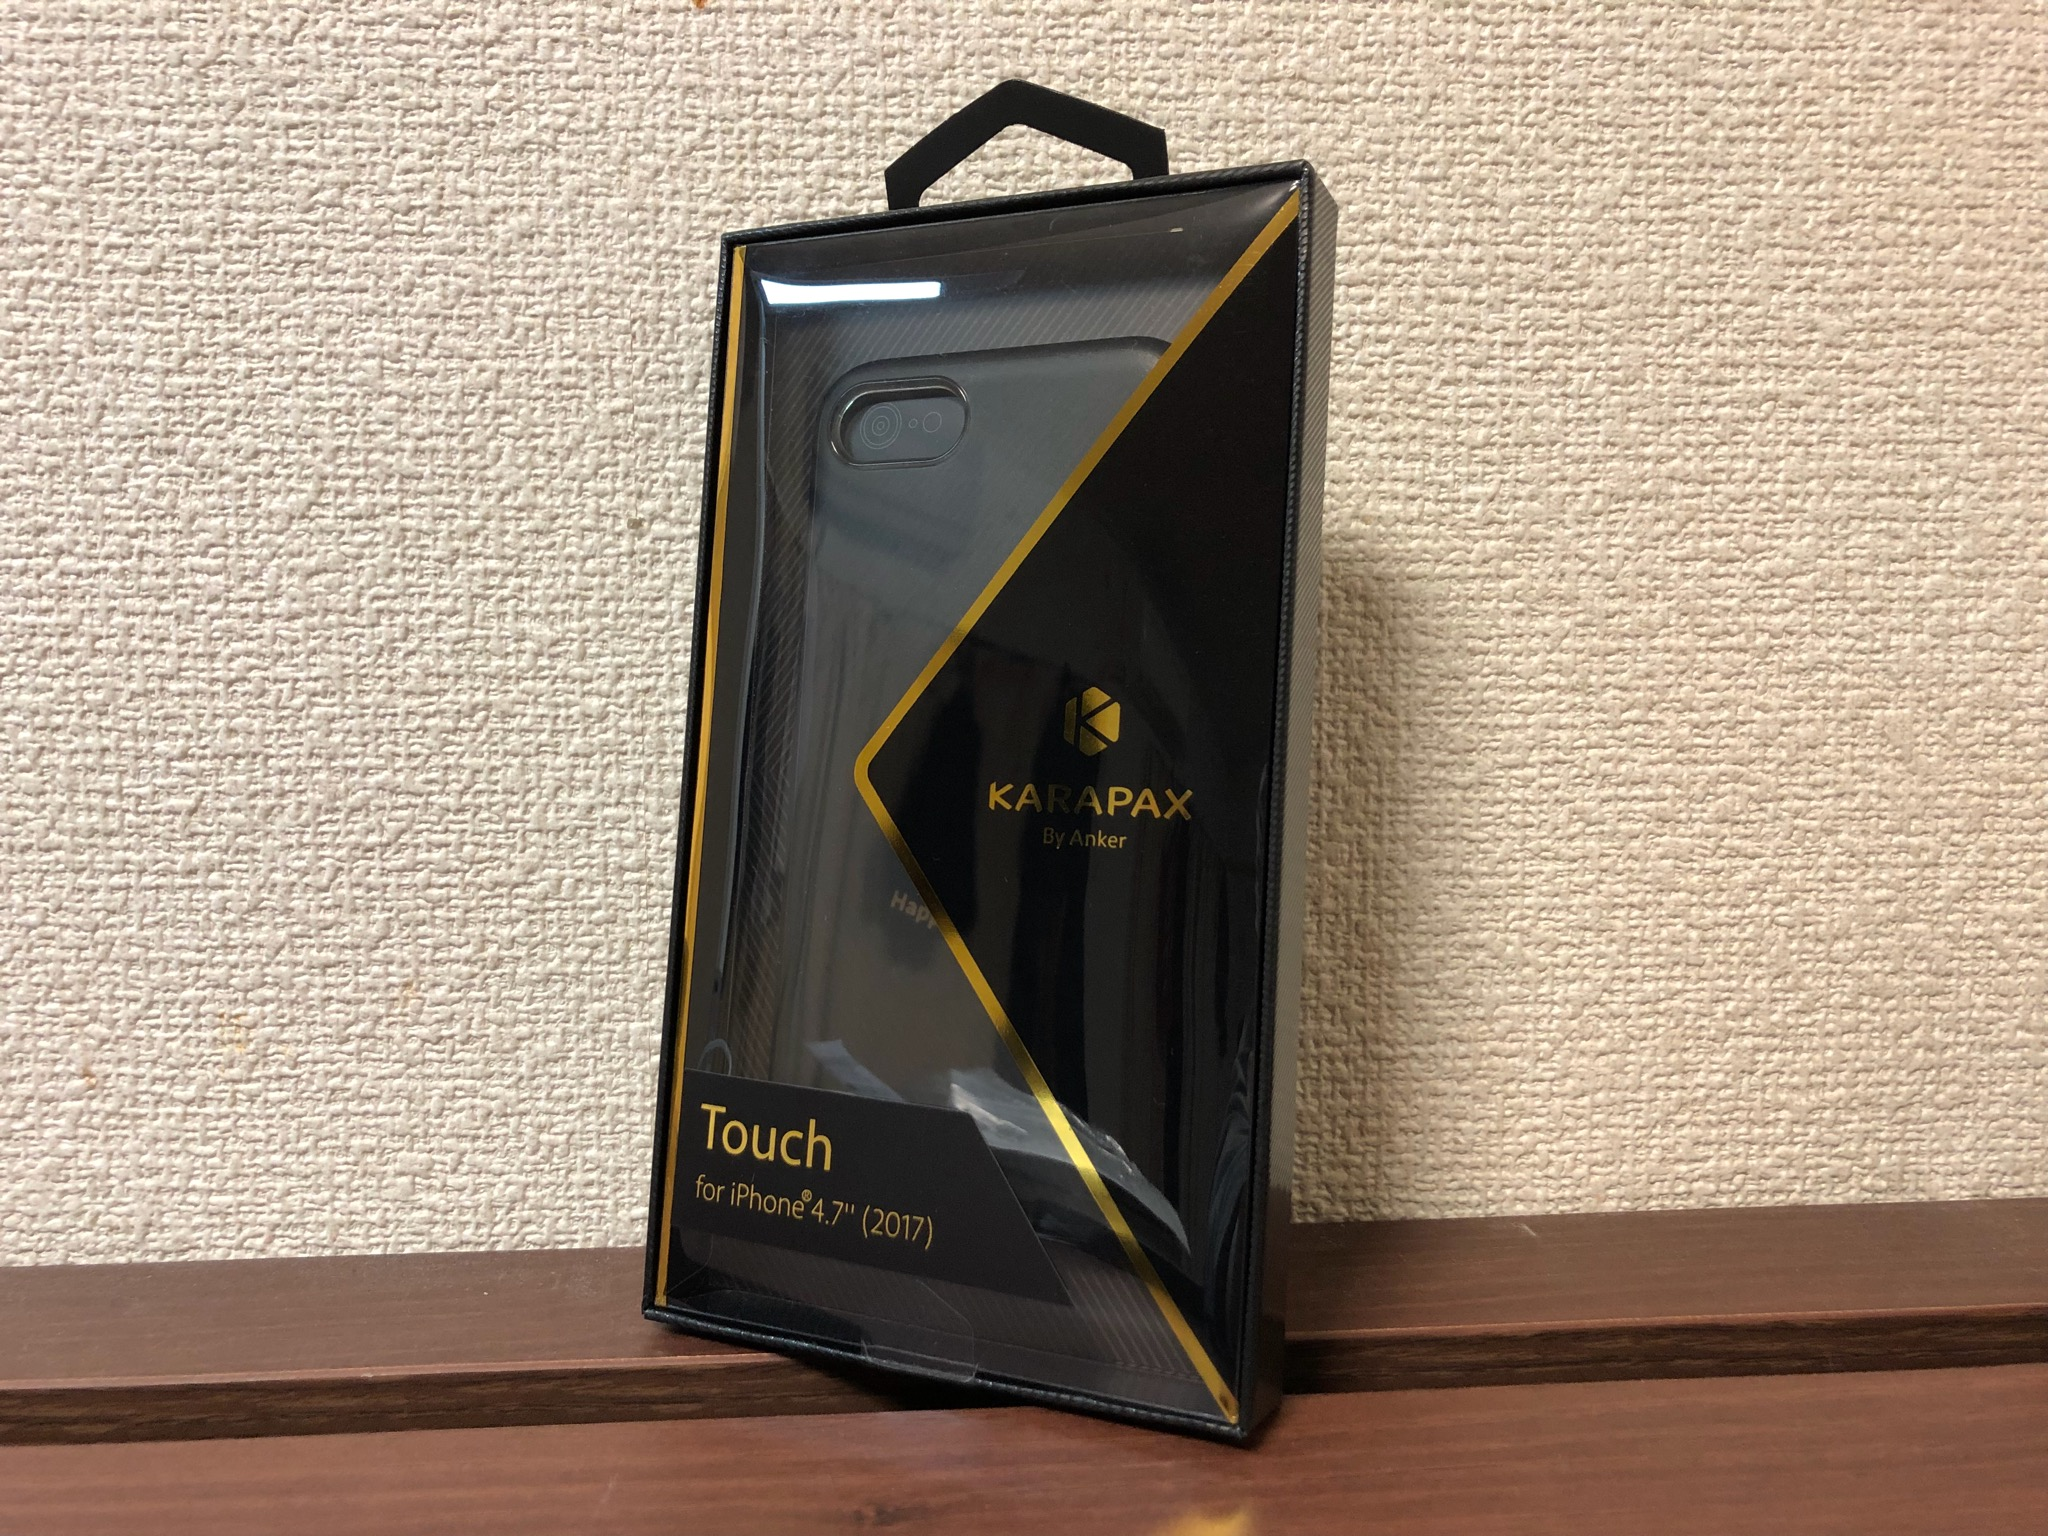 Anker KARAPAX Touch